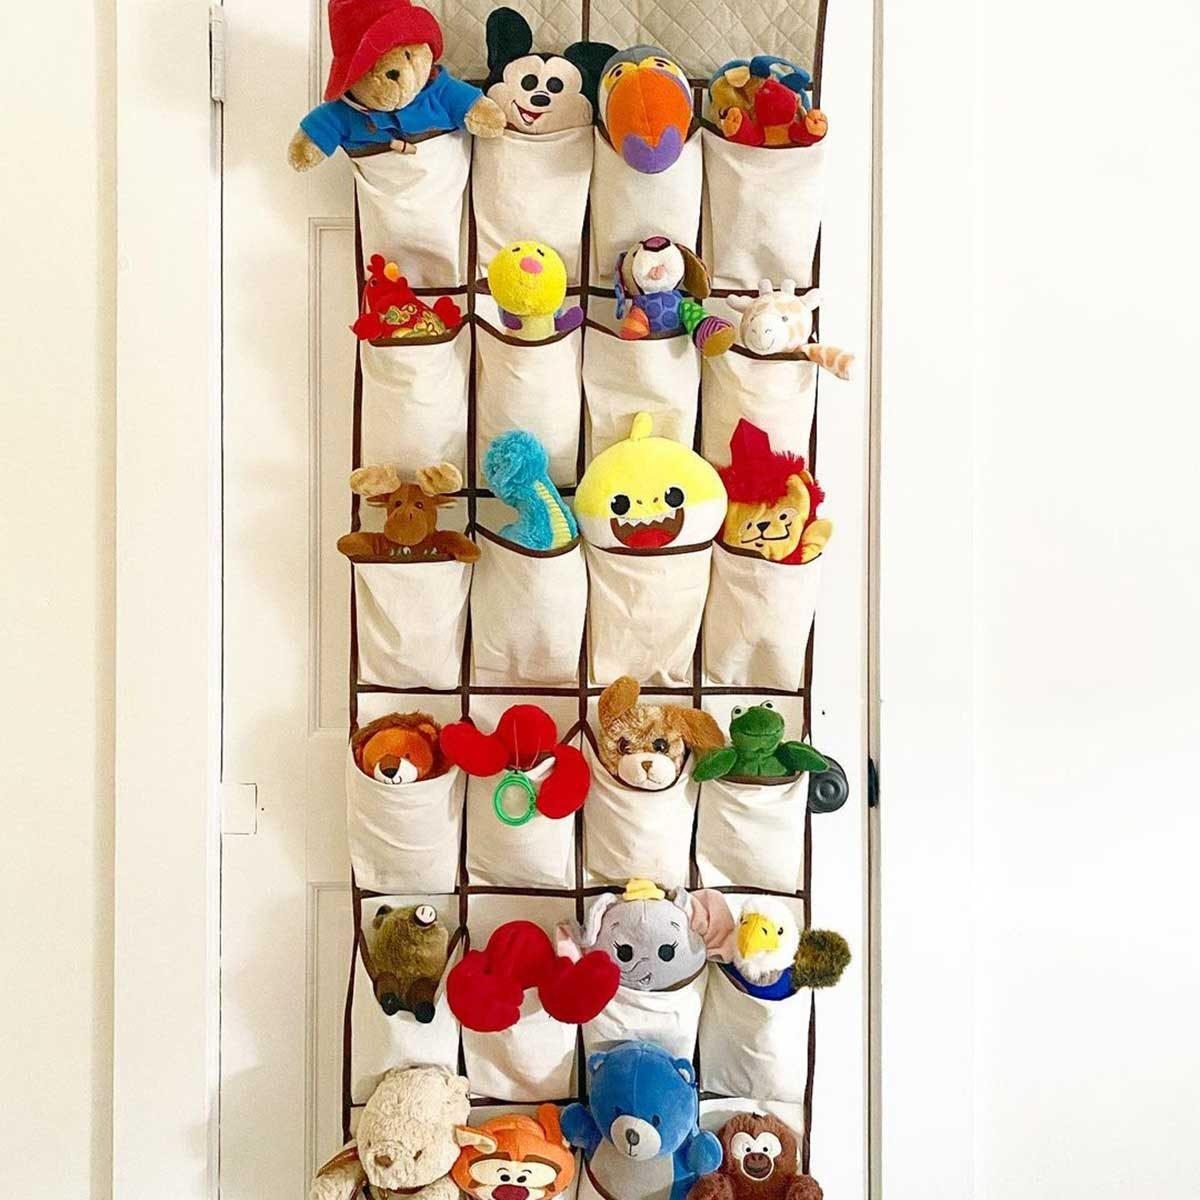 Stuffed Animal Storage 138600350 699891154010431 743092864784579756 N